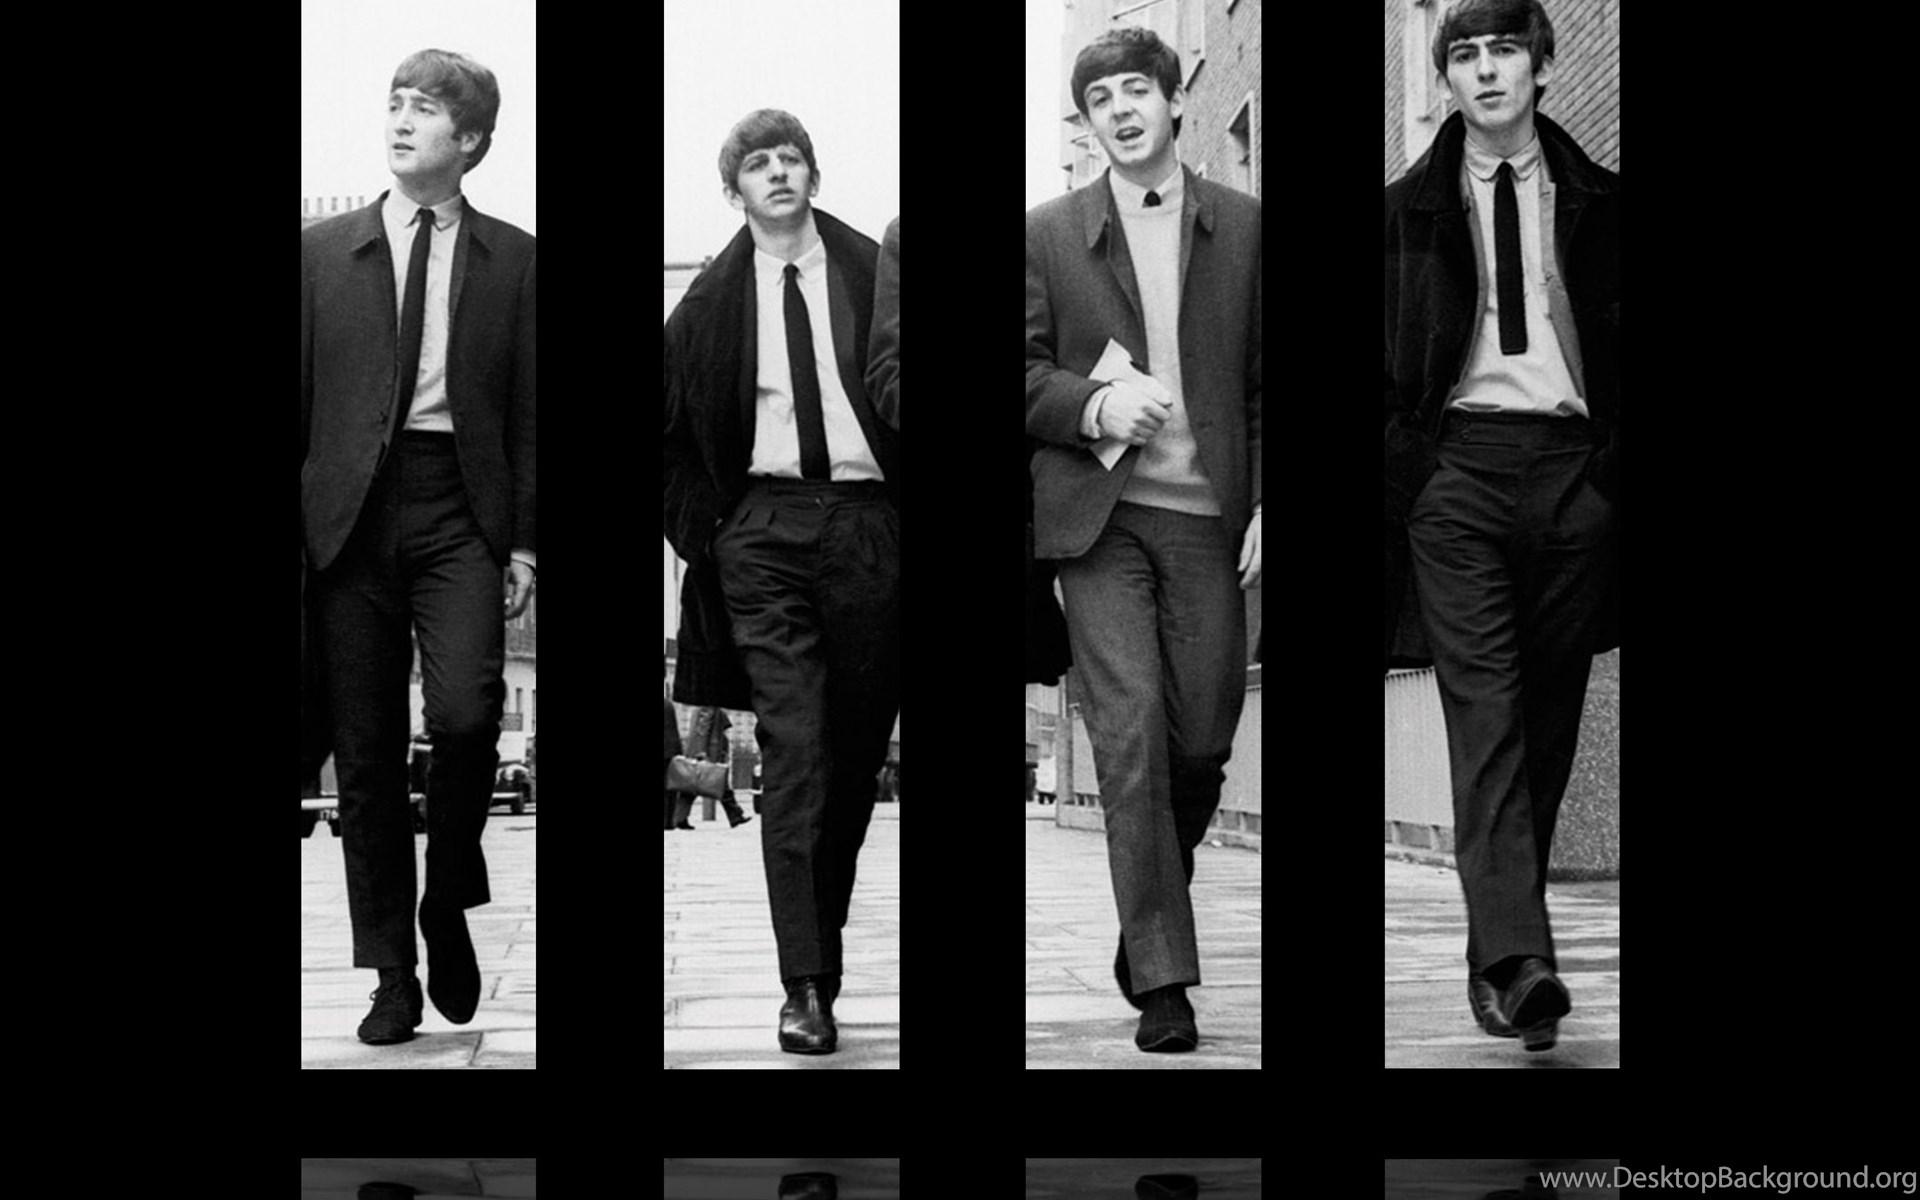 Download The Beatles Wallpapers For Windows Desktop Background